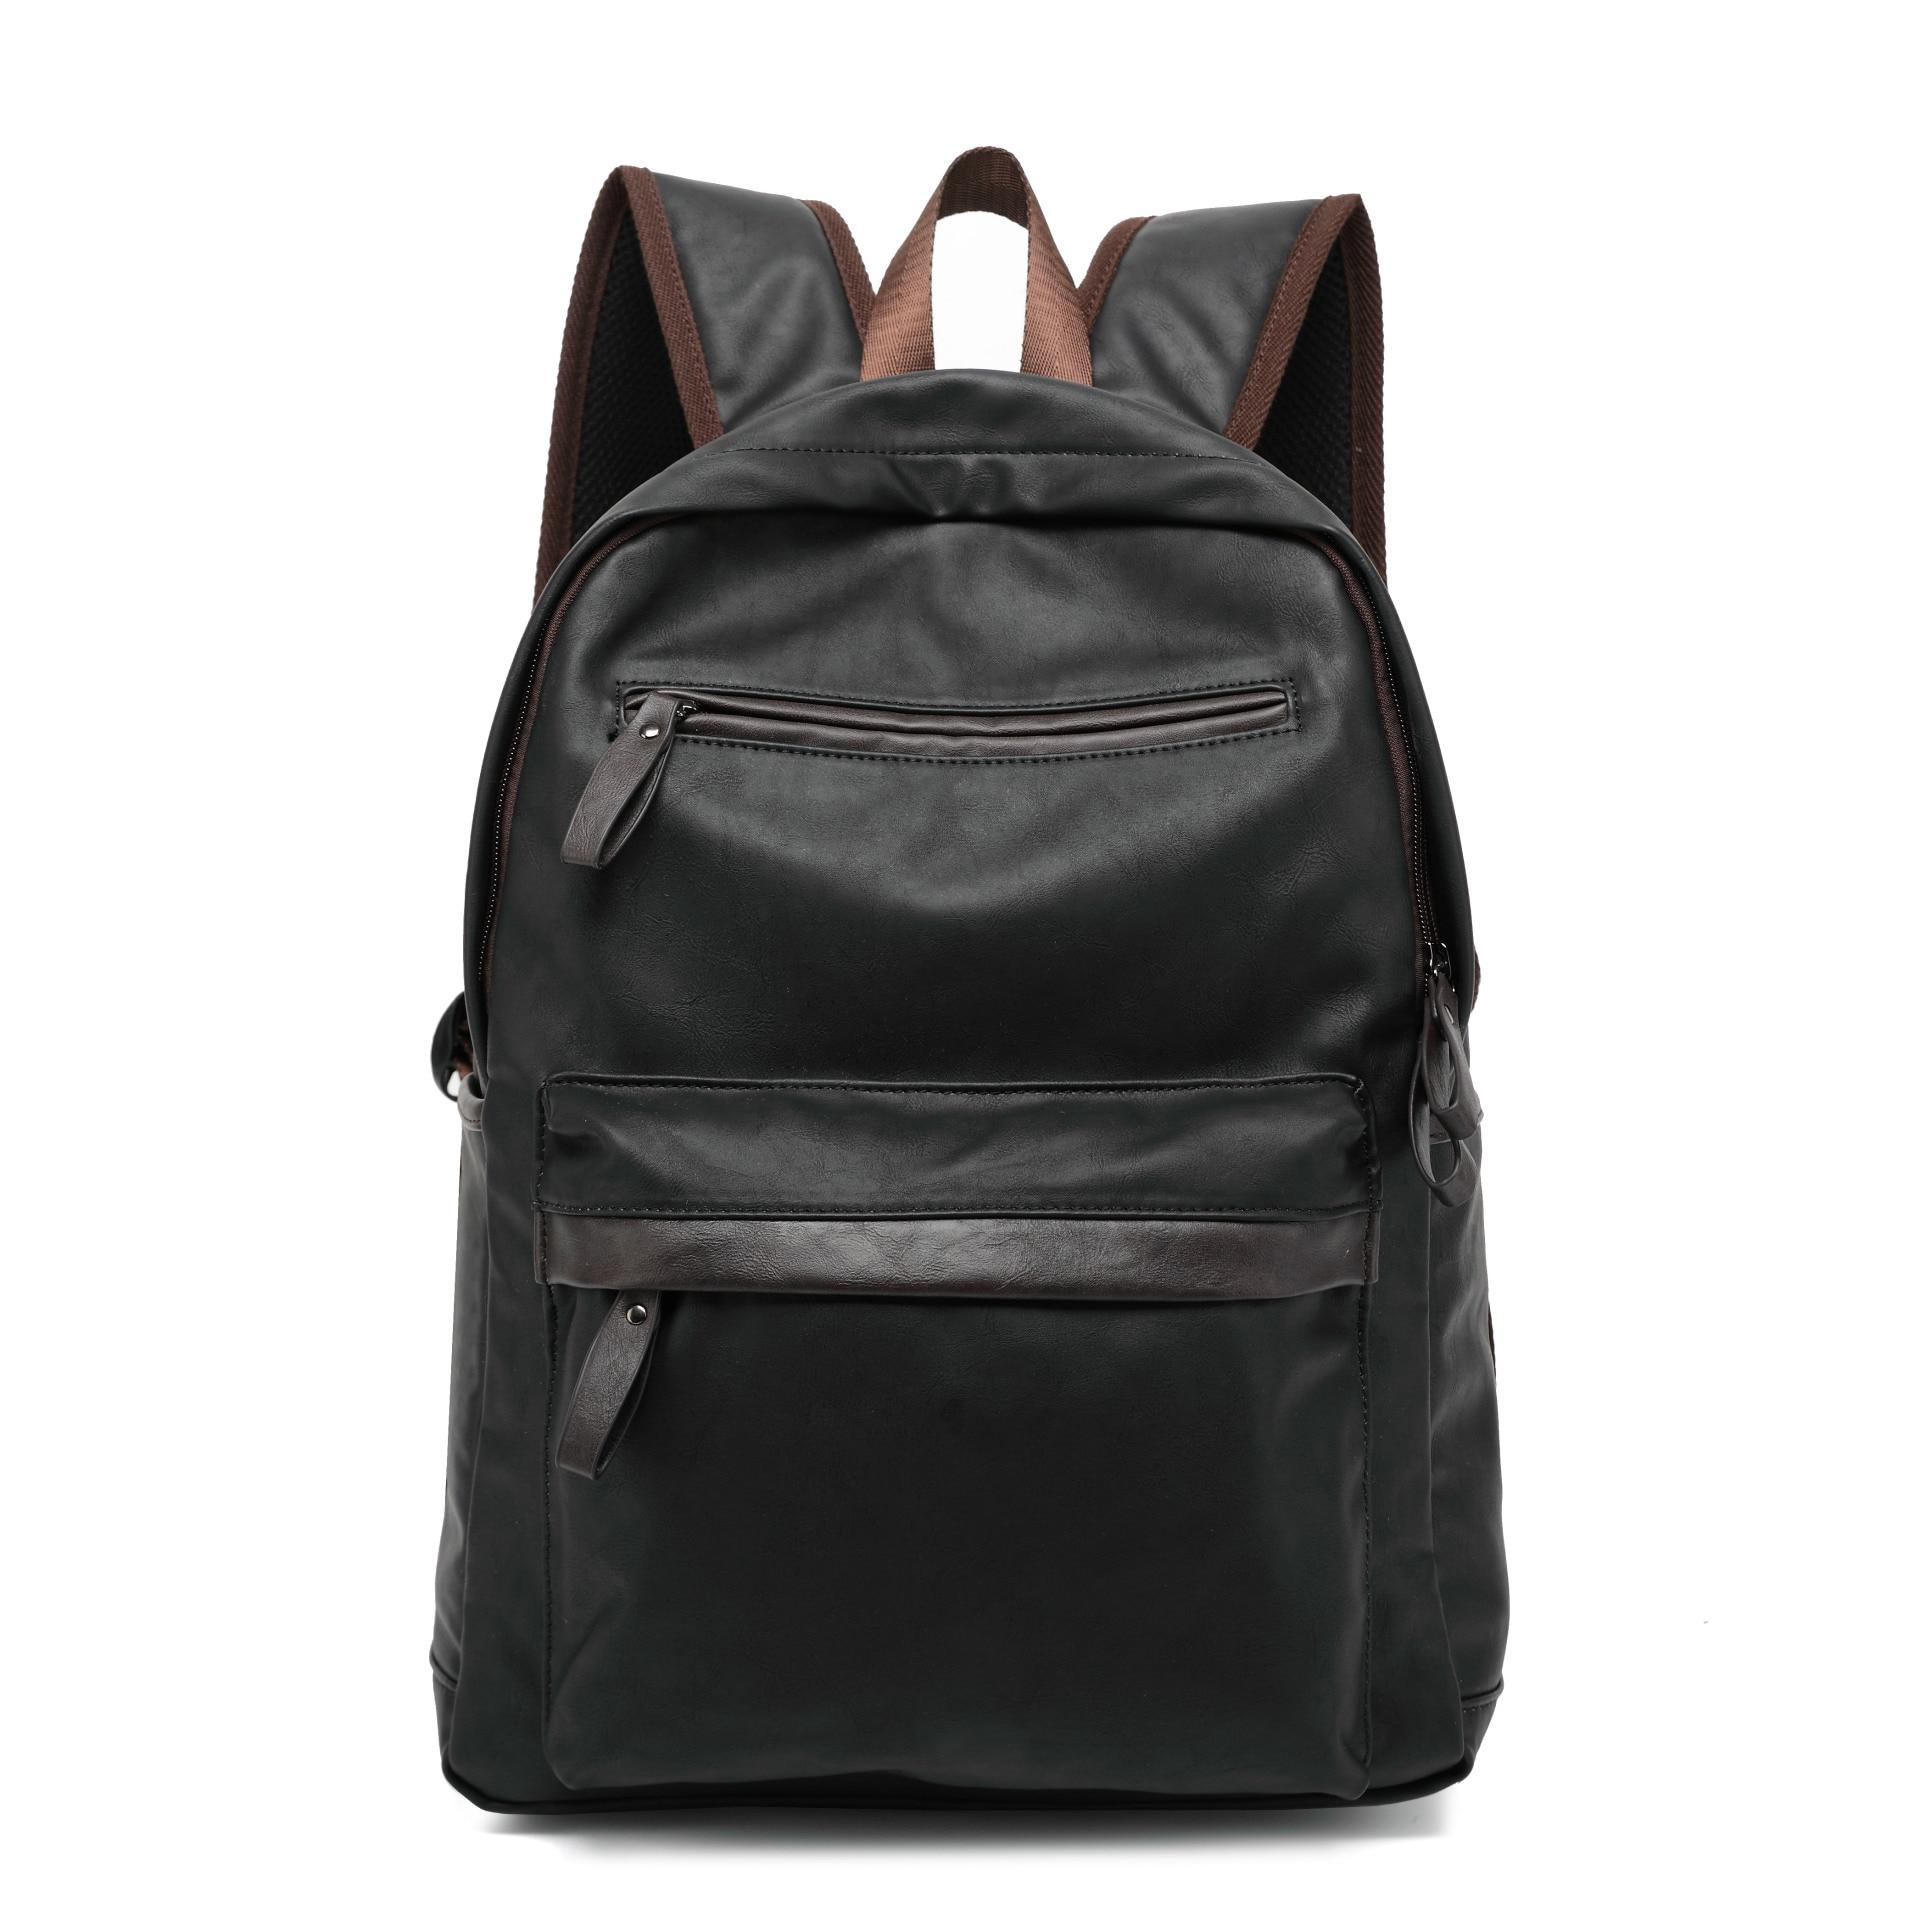 2017 Brand Waterproof Laptop Backpack Men Pu Leather Backpacks for Teenager Men Casual Daypacks Solid Black Brown Travel Bagpack coofit brand designer elegant women s backpack chic solid pu leather bagpack for girls teenager casual female backpacks rucksack